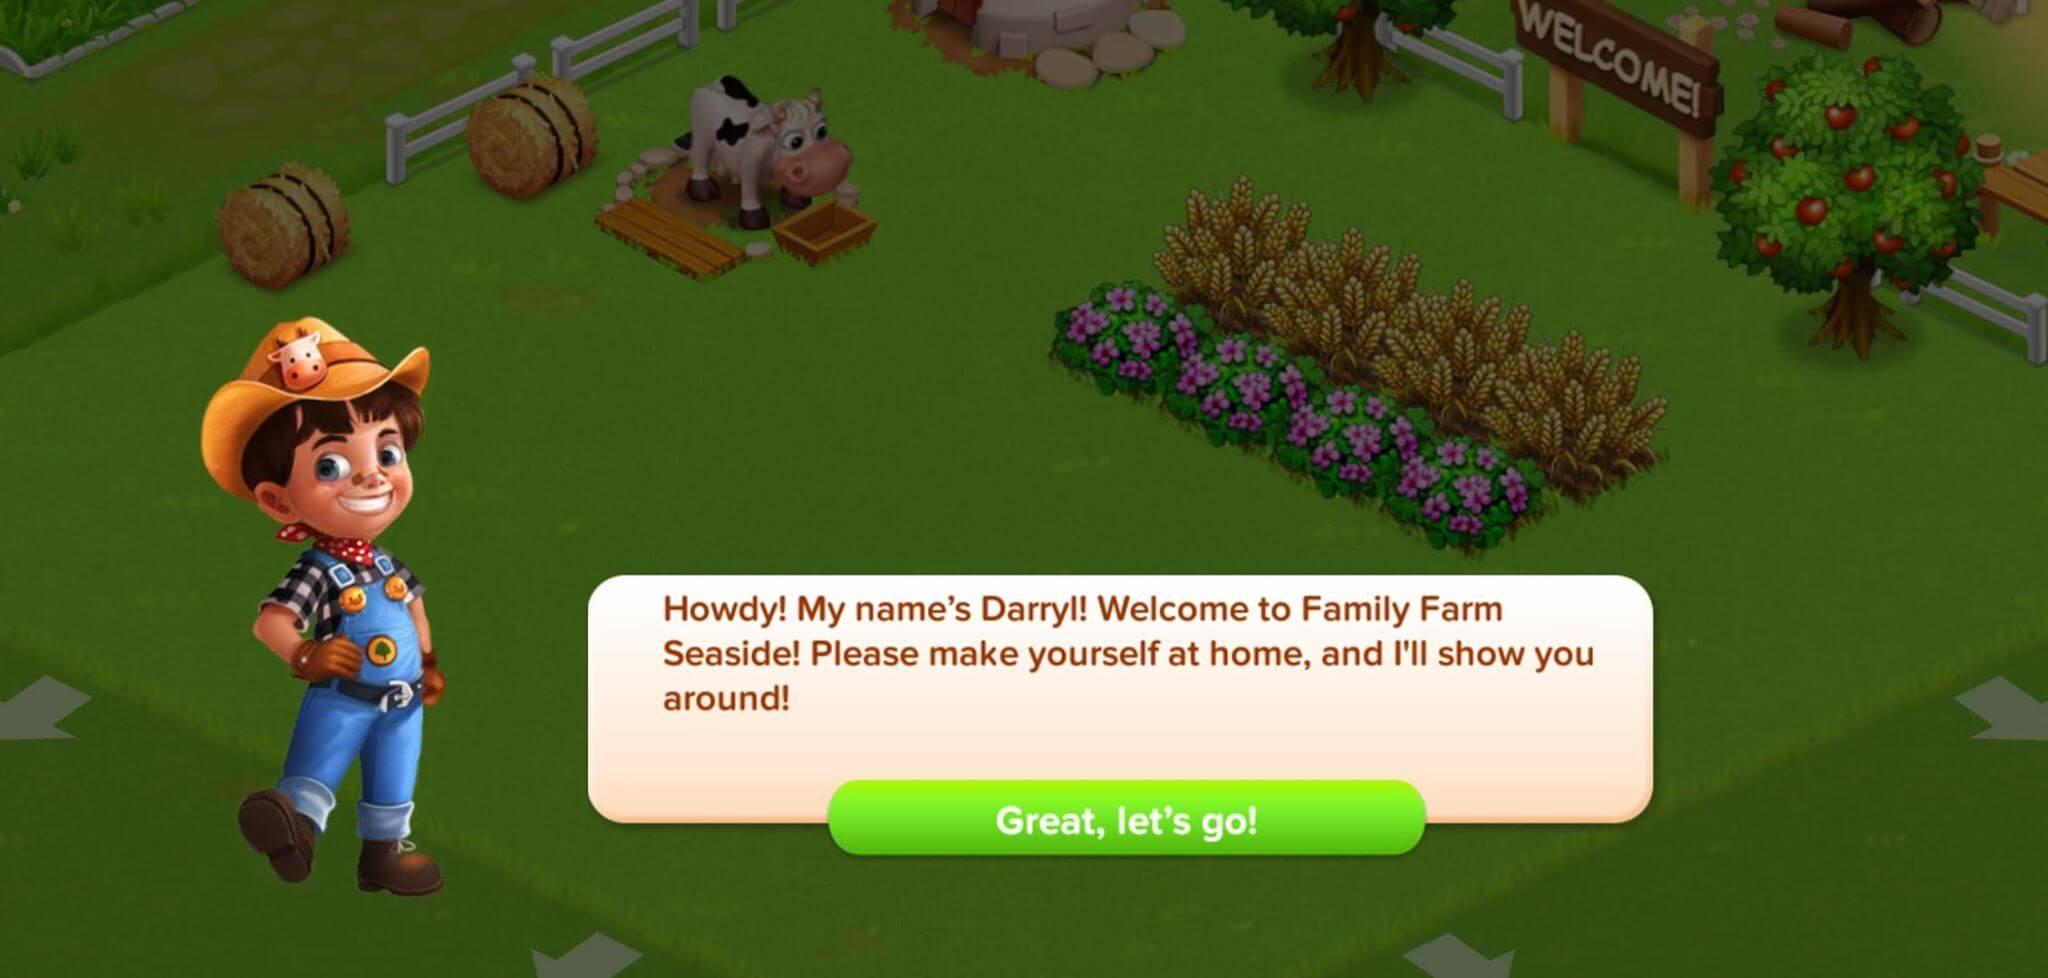 seaside family farm darryl